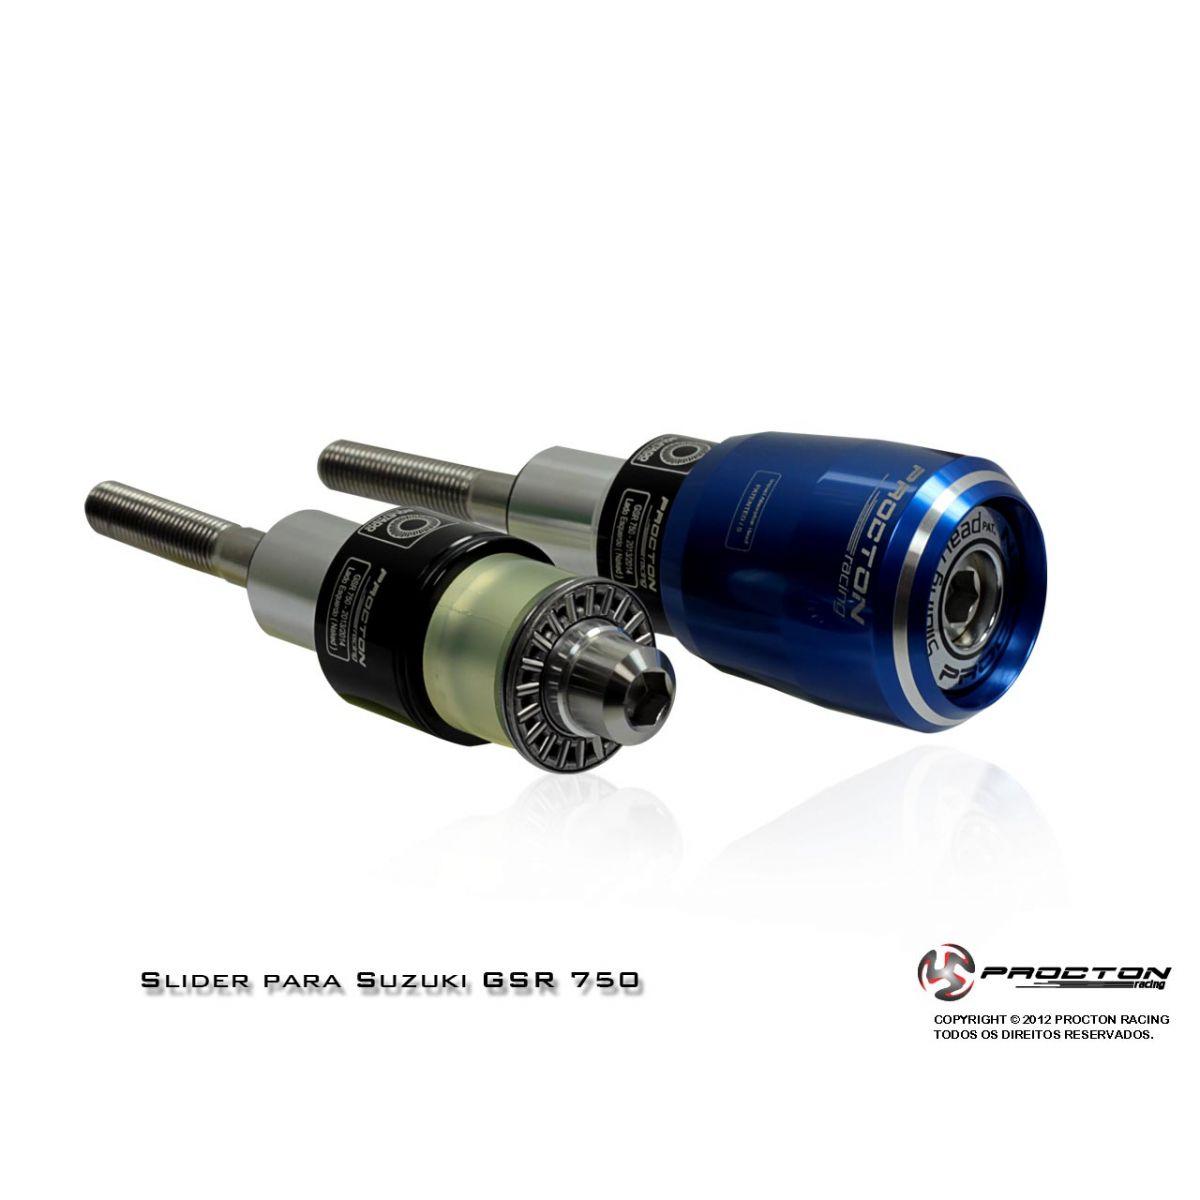 Slider Procton com Amortecimento Suzuki GSR750 - Naked - 13/16 (Roletado)